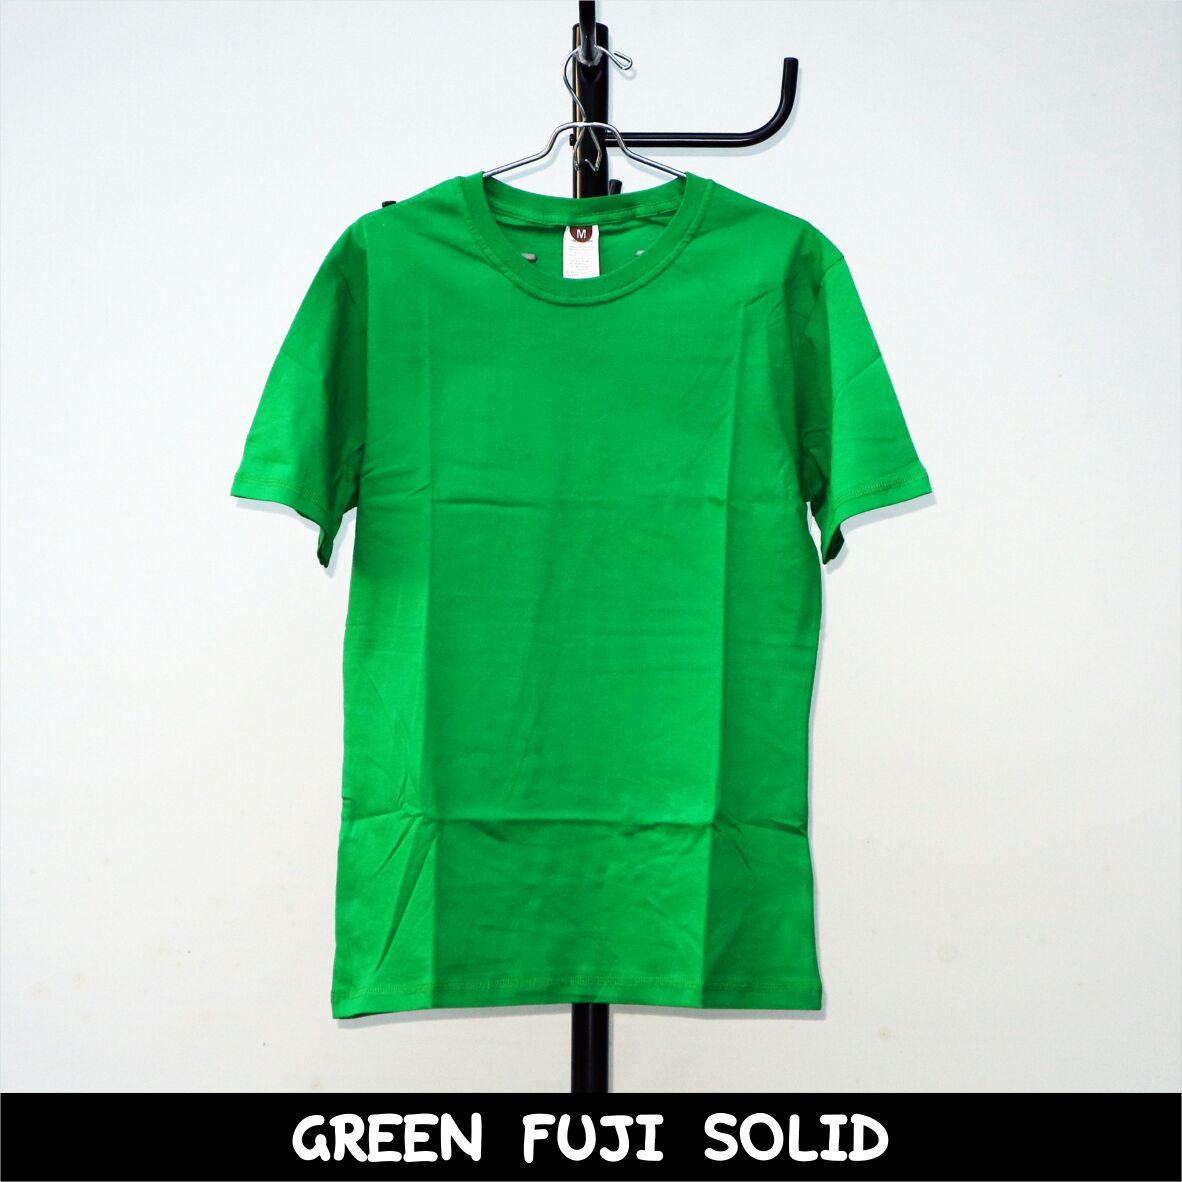 Kaos Polos Premium Shop Line Teal Solid Green Fuji